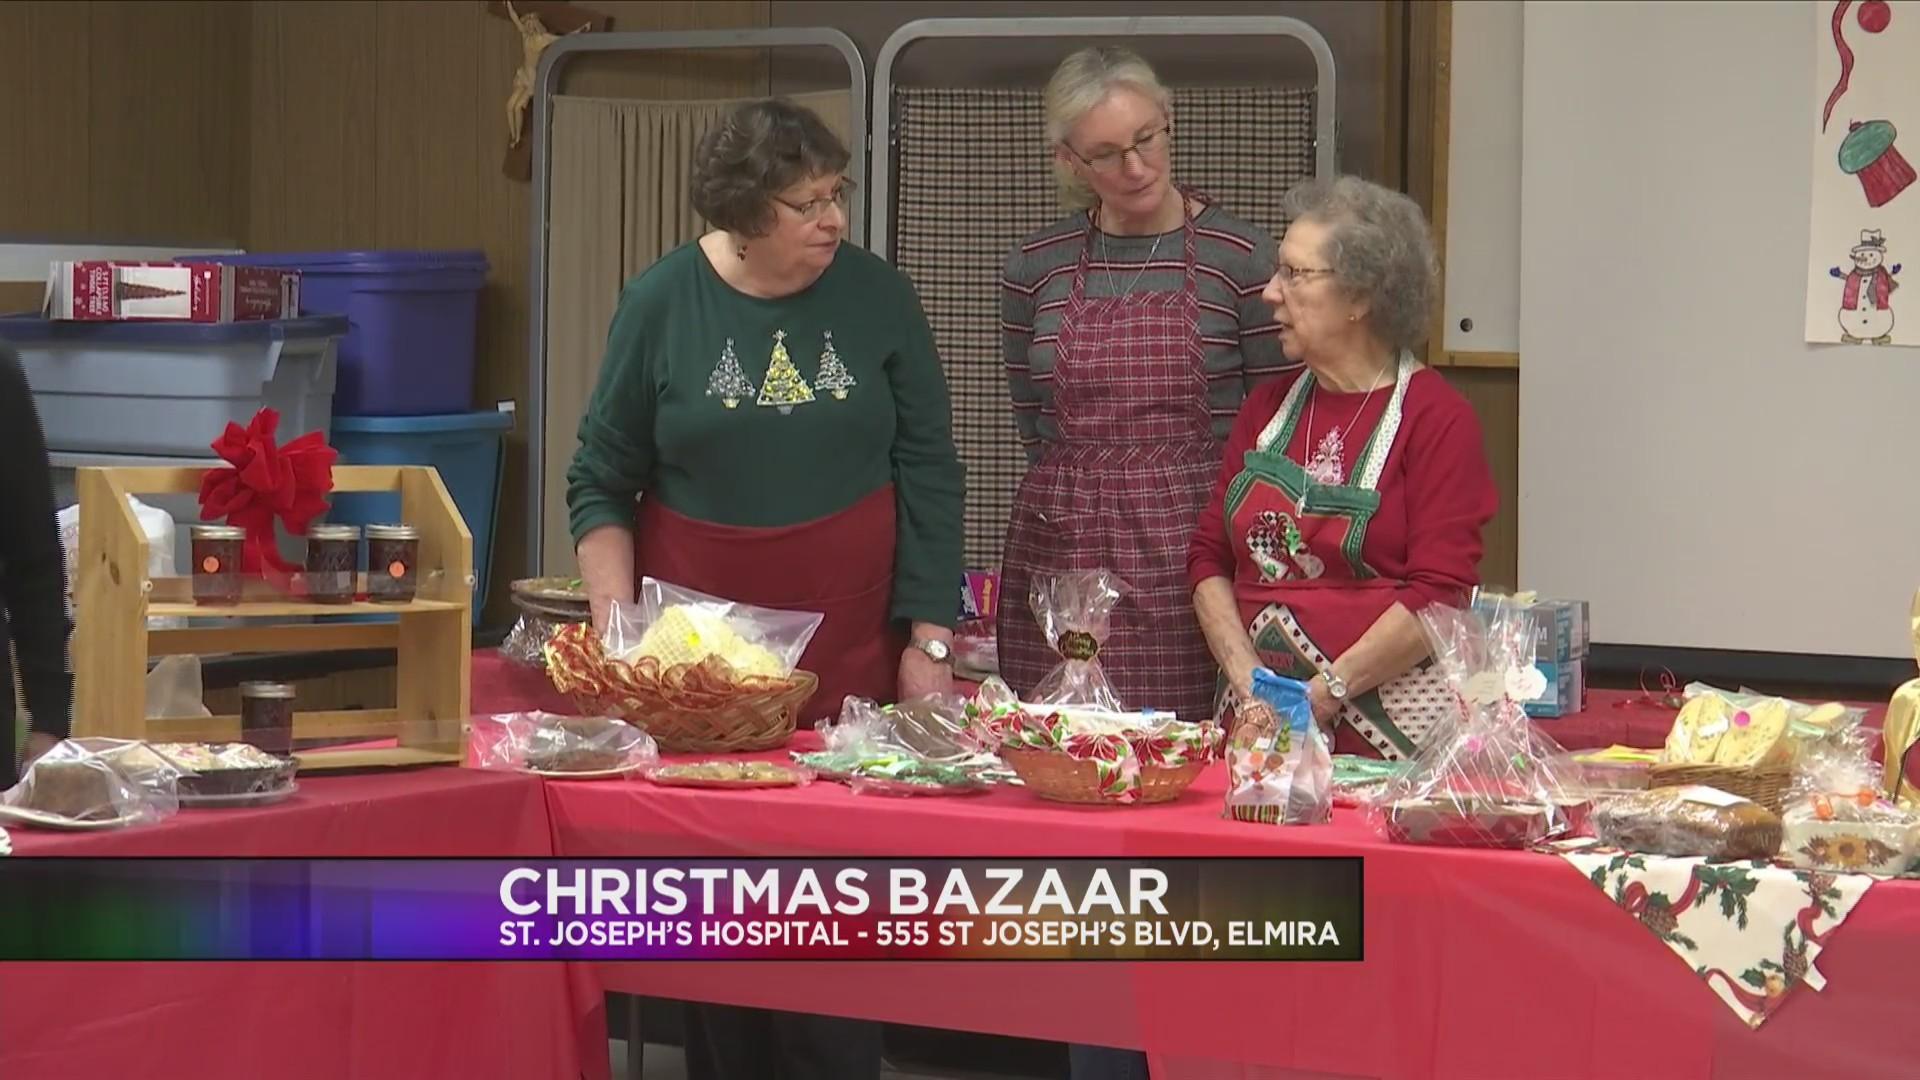 Annual_Christmas_Bazaar_benefits_local_h_0_20181109223815